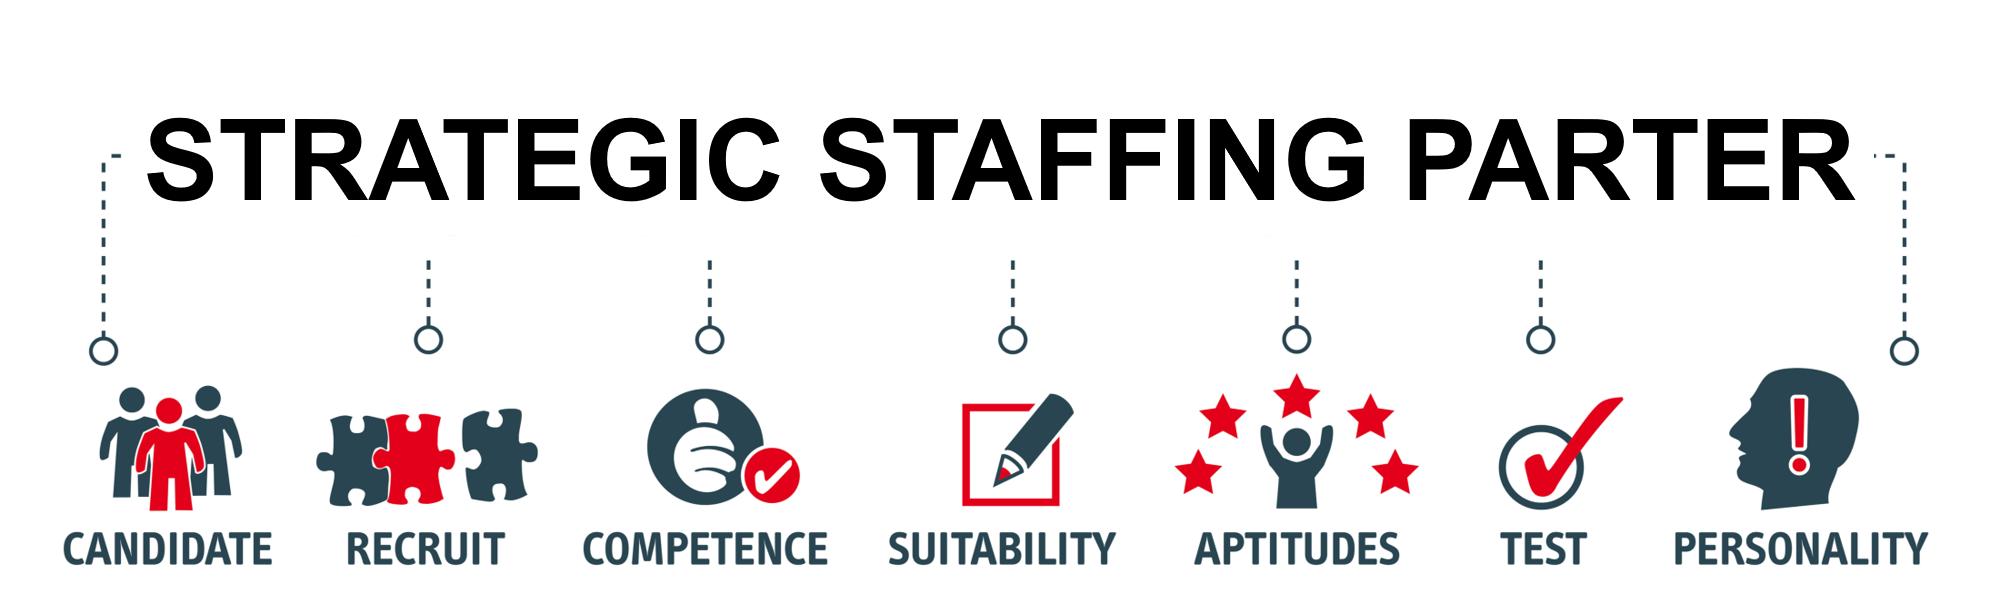 Stratregic Staffing Partner